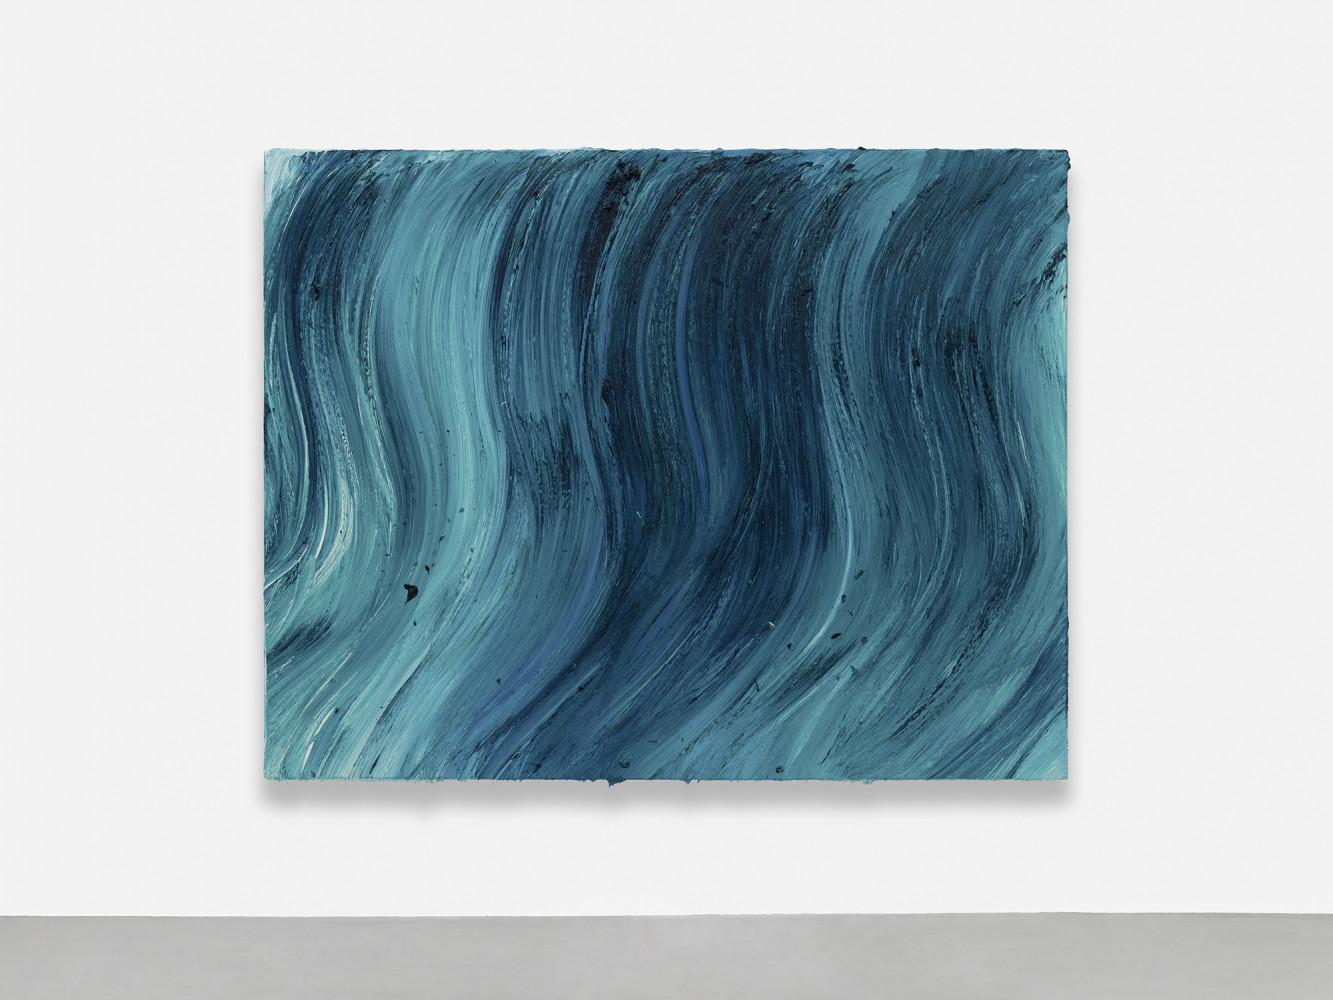 Jason Martin, 'Untitled (Caribbean blue / Heliogen green)', 2020